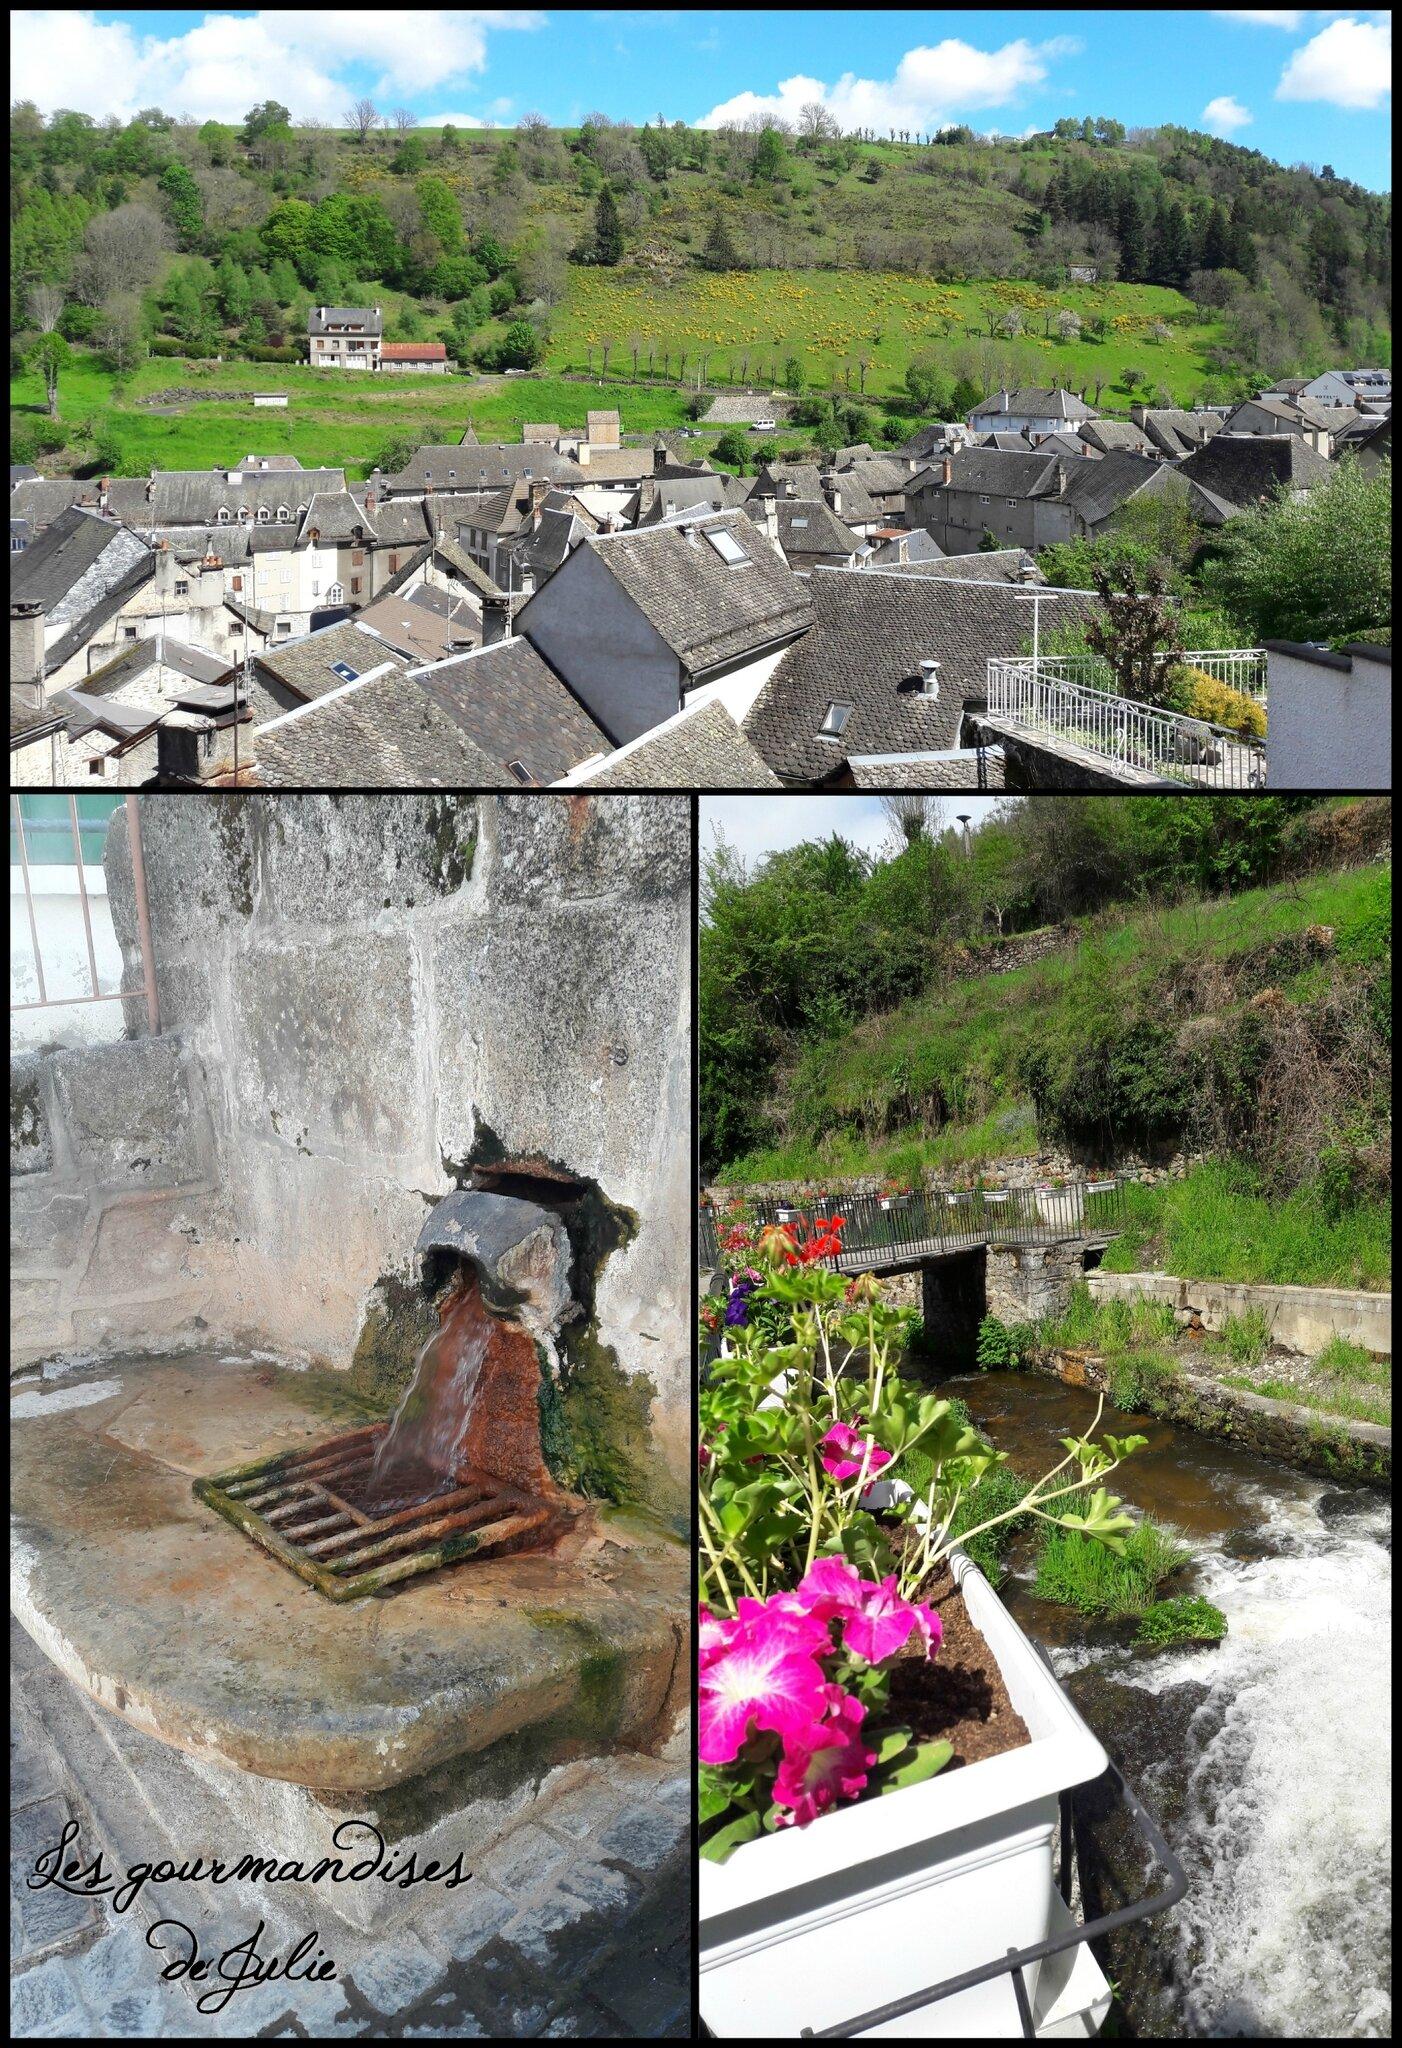 Que Faire Ce Week End Dans Le Cantal : faire, cantal, Week-end, Cantal, Dîner, Serge, Vieira, Gourmandises, Julie